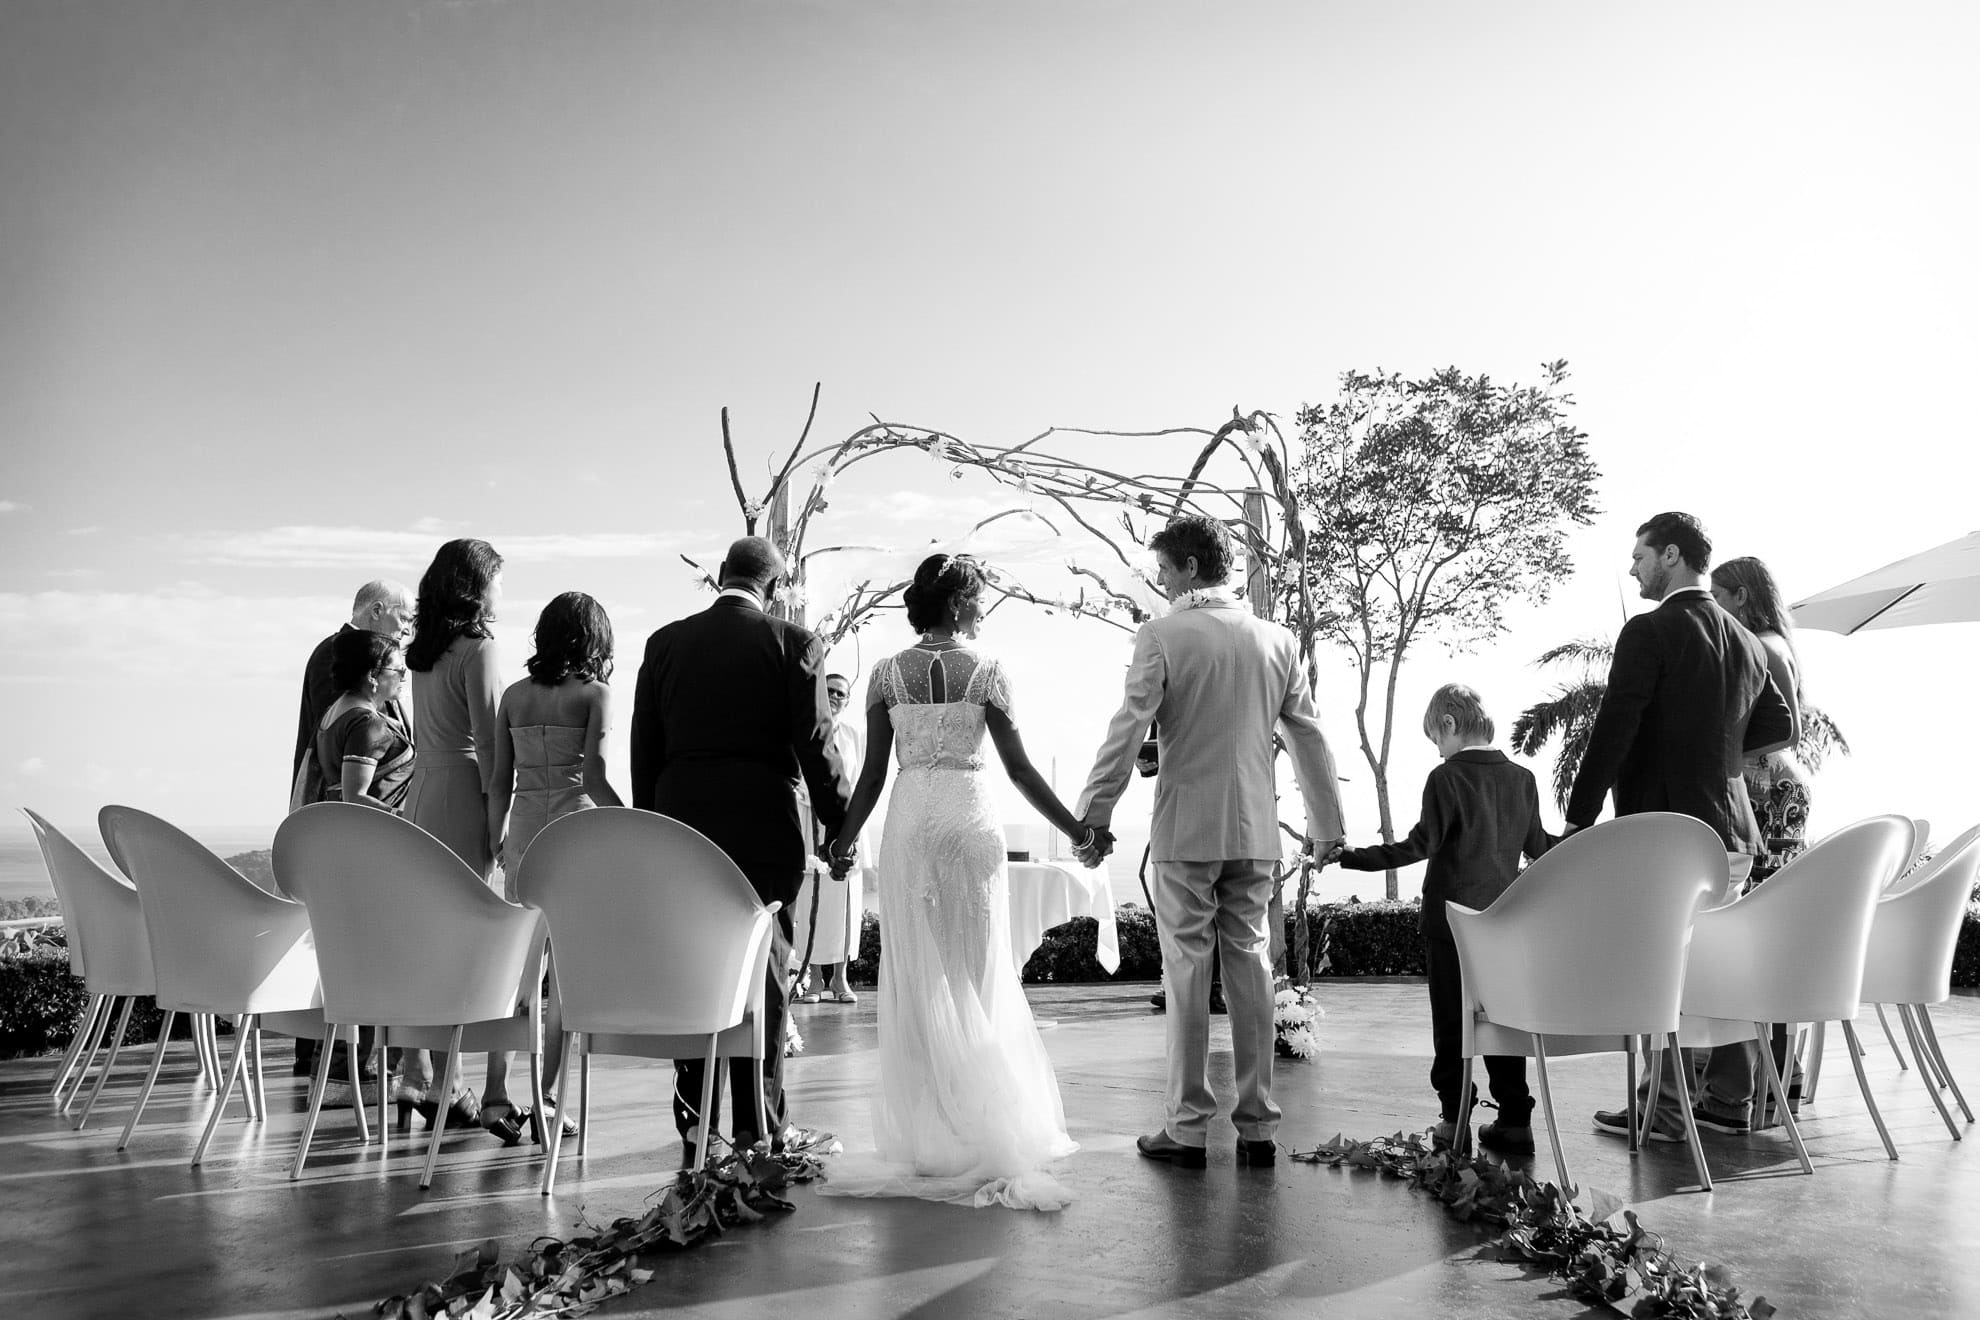 Wedding ceremony at Mariposa Hotel, a crown jewel of outdoor wedding venues